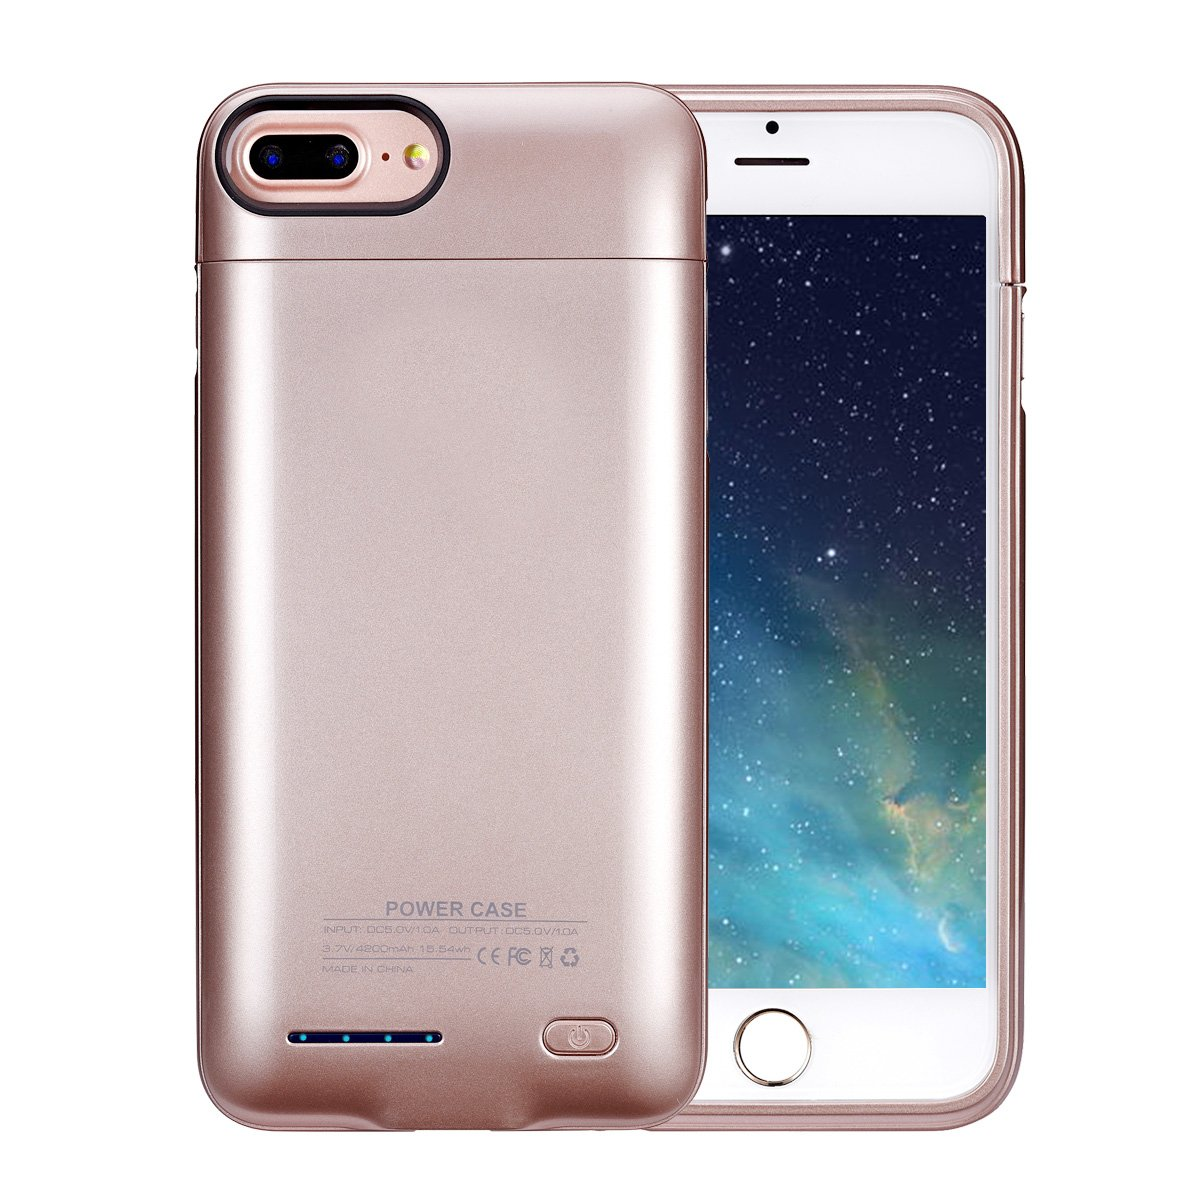 iPhone 8 Plus / 7 Plus / 6s Plus高容量バッテリーケース超スリム拡張バッテリーケース4200 mAh For Iphone 8 plus / 7 Plus / 6s Plus外部ジュースパック充電器ケース5.5インチ B074FT1VW2  5.5\